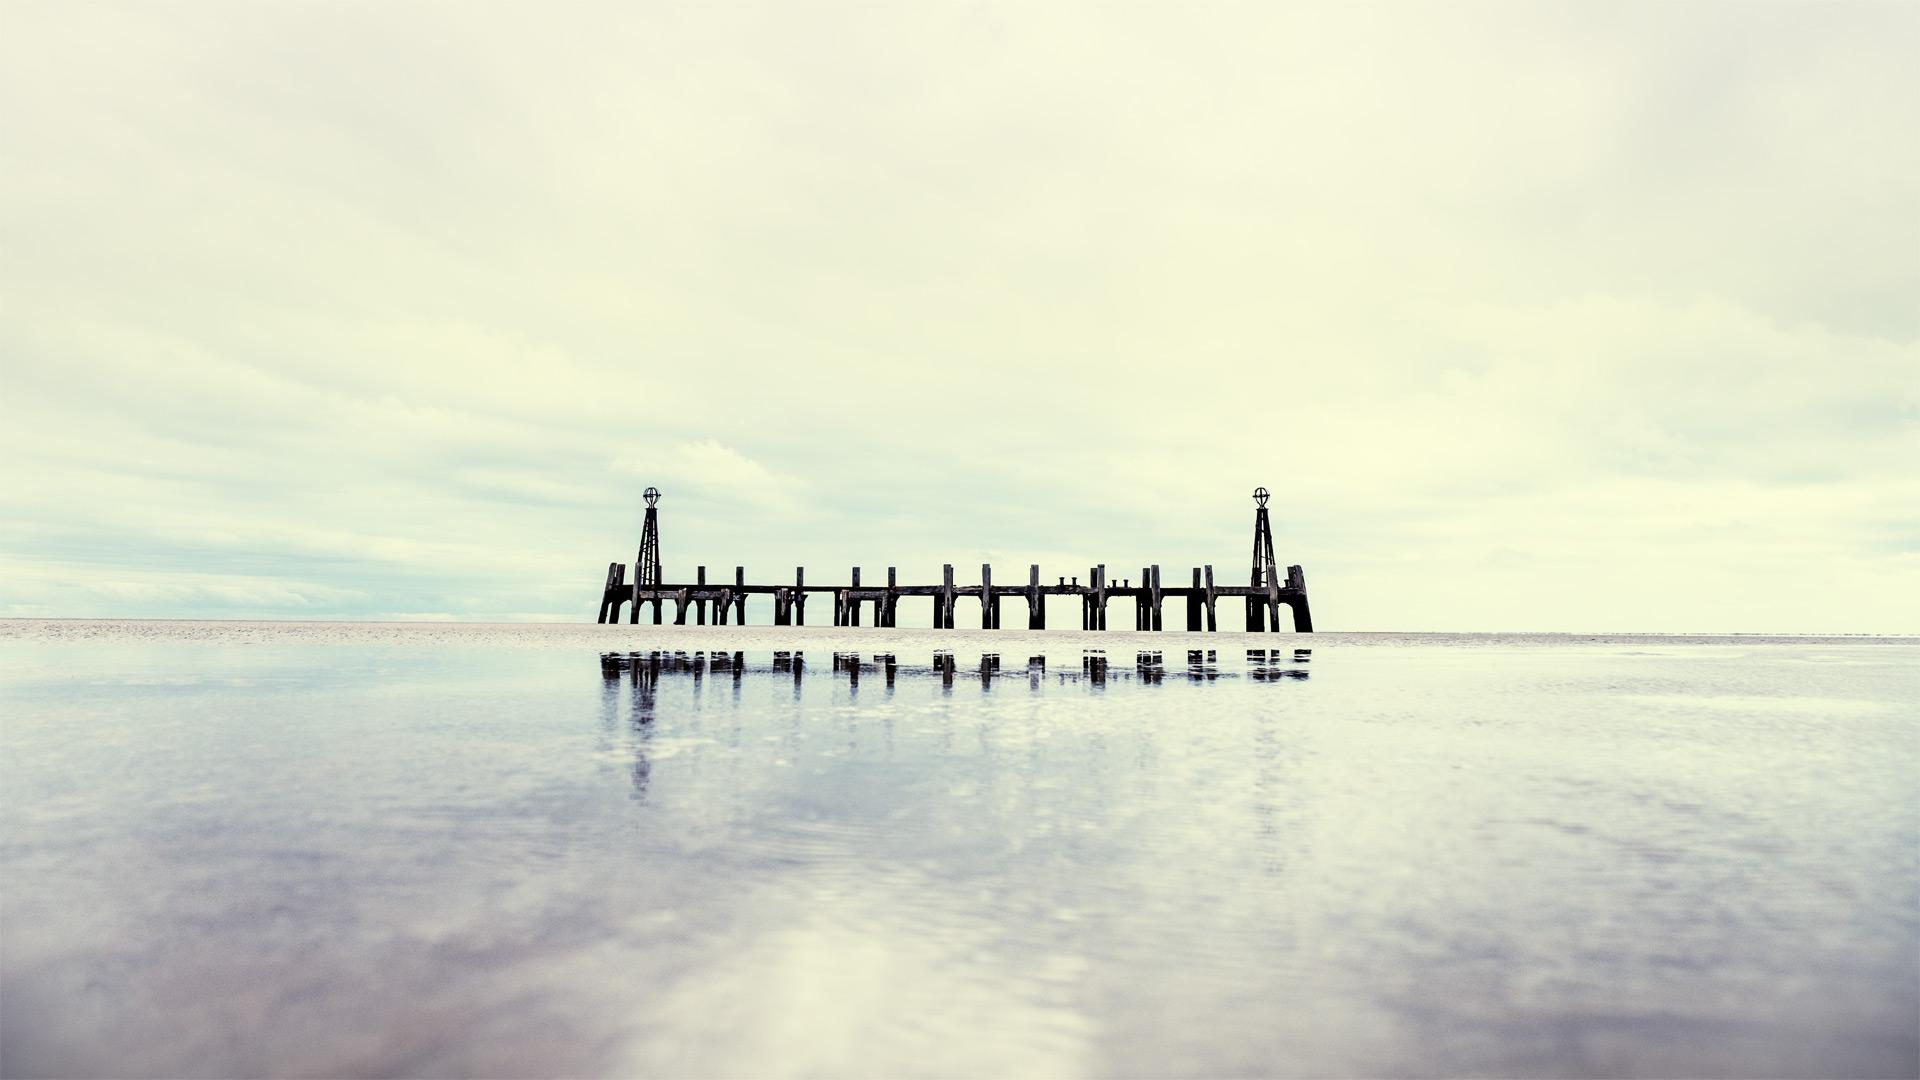 St. Annes Pier / St Annes Pier, St Annes, Show the Original, Landscape Photography, Fujinon XF 16-55mm f/2.8, Fujifilm X-T1, Architectural Photography [st annes pier f]